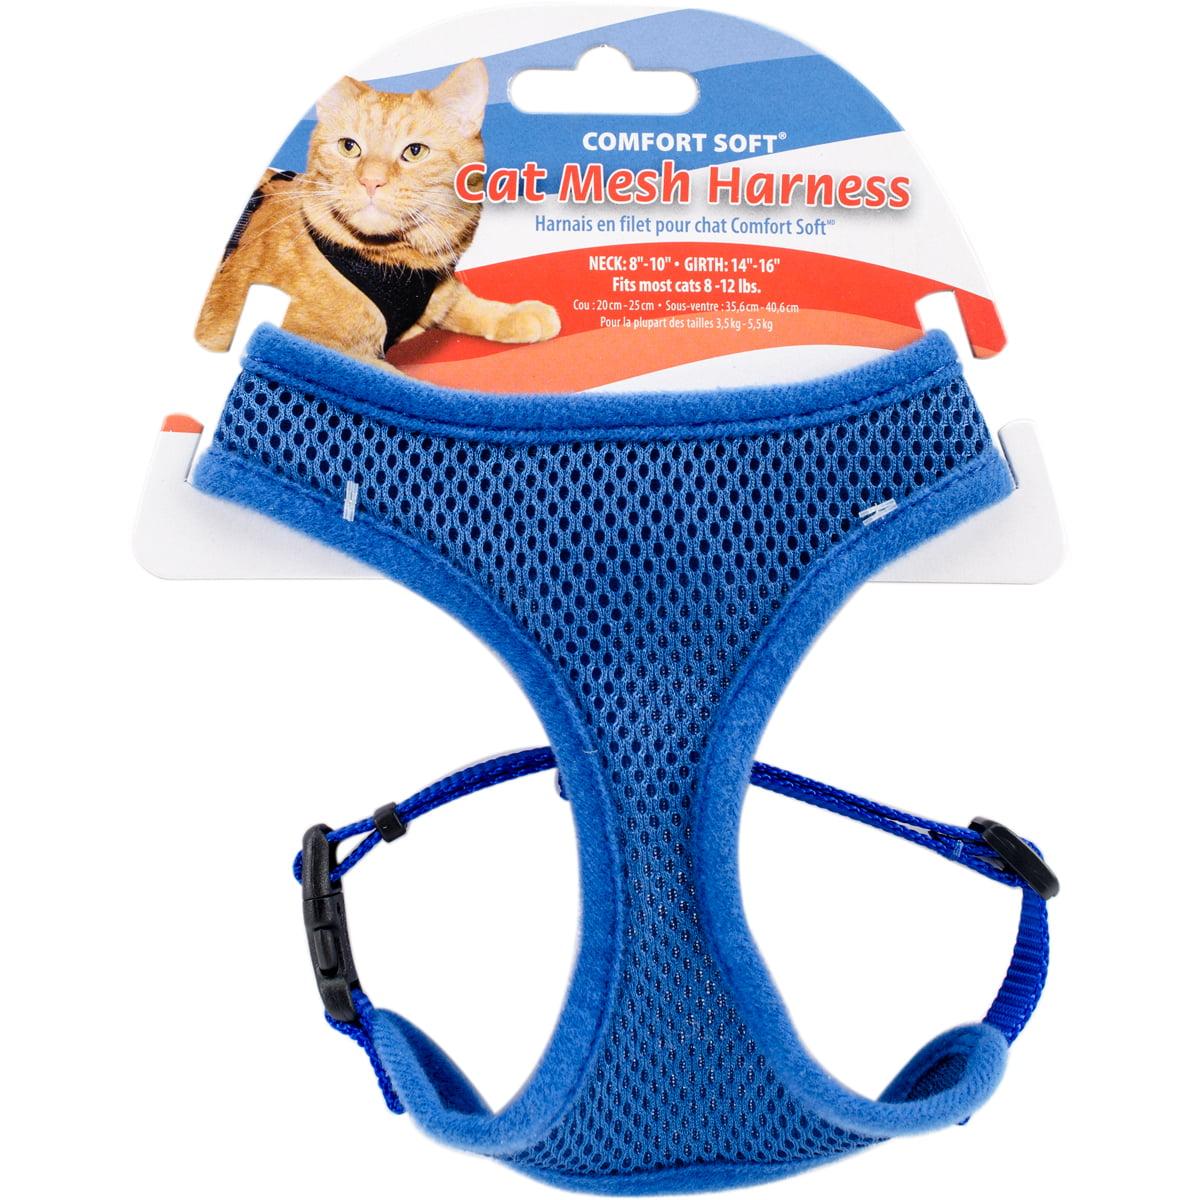 Comfort Soft Adjule Mesh Cat Harness Blue